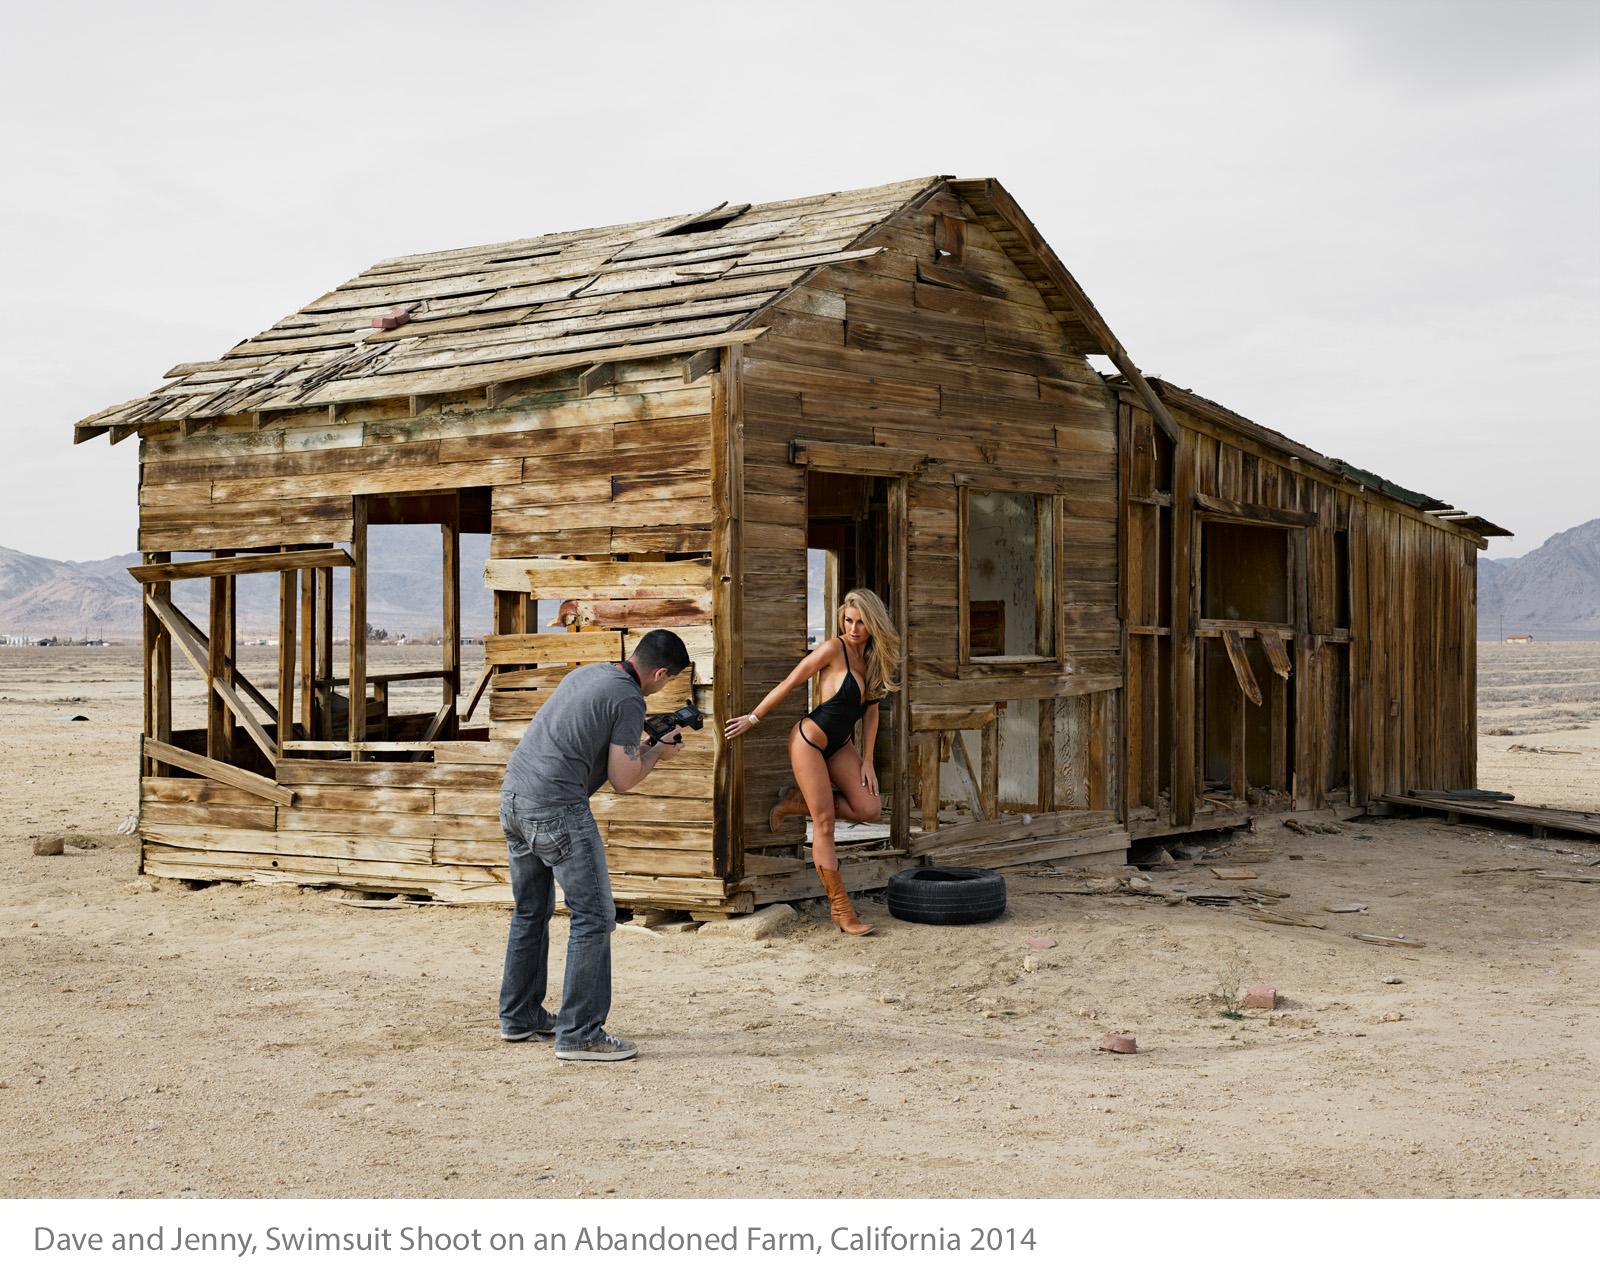 34_LucasFoglia_HumanNature_Swimsuit-Shoot-on-an-Abandoned-Farm-1-copy